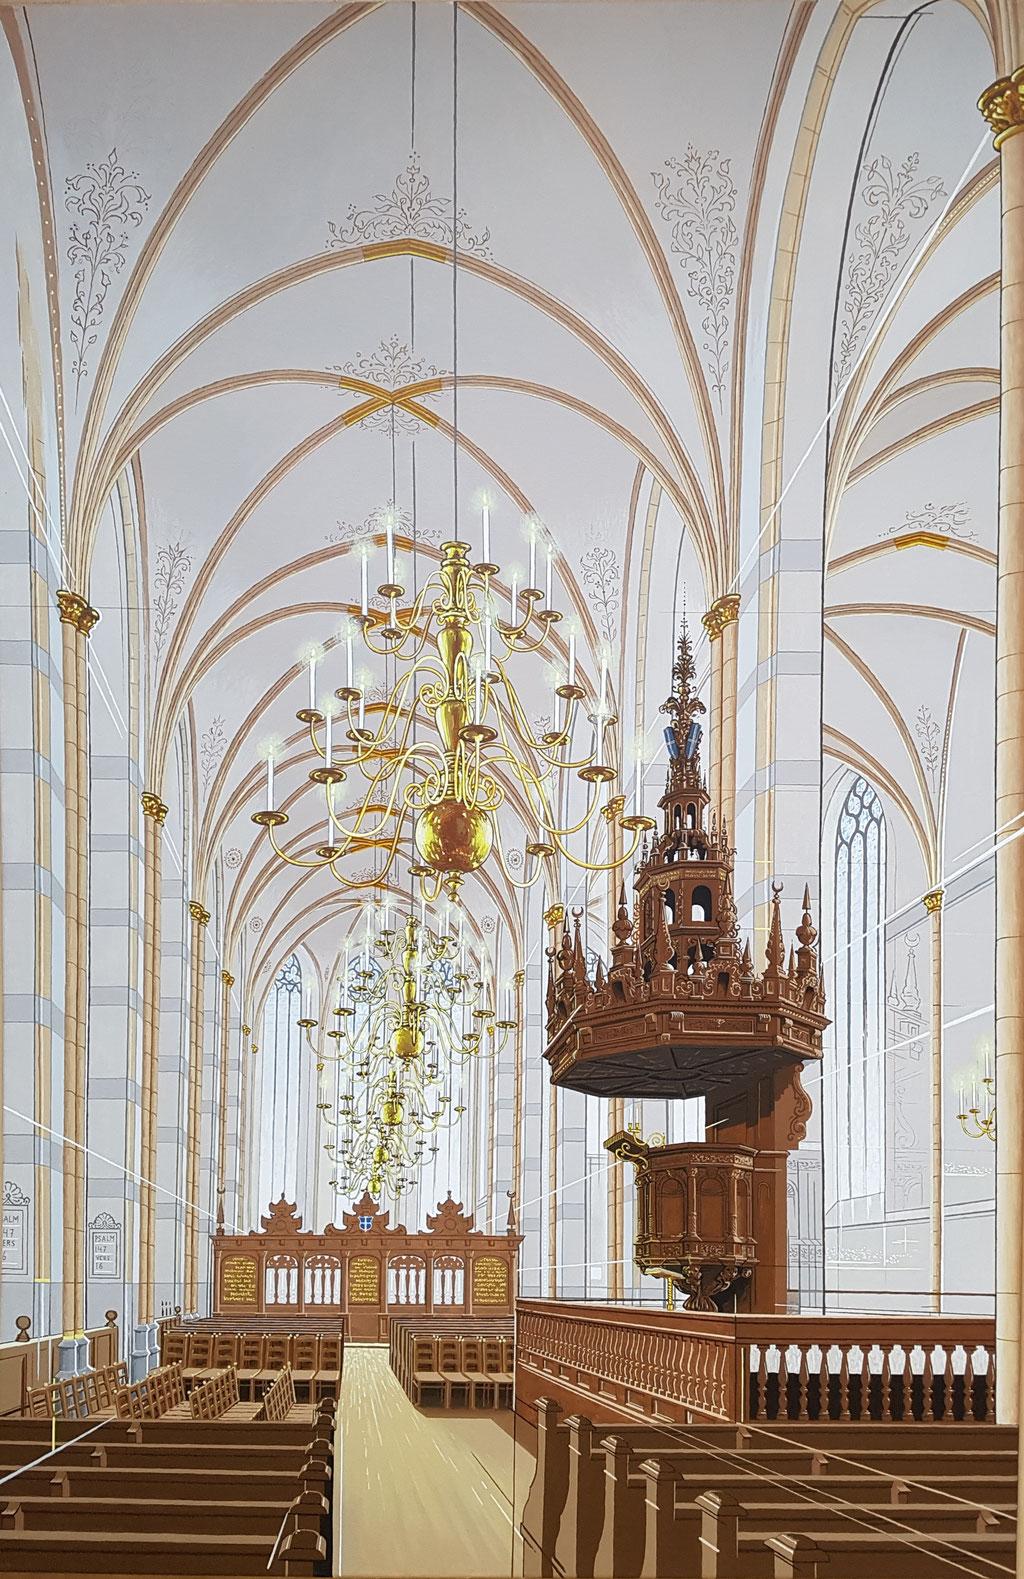 Grote Kerk Zwolle, Acryl op doek, 115 bij 75 cm.